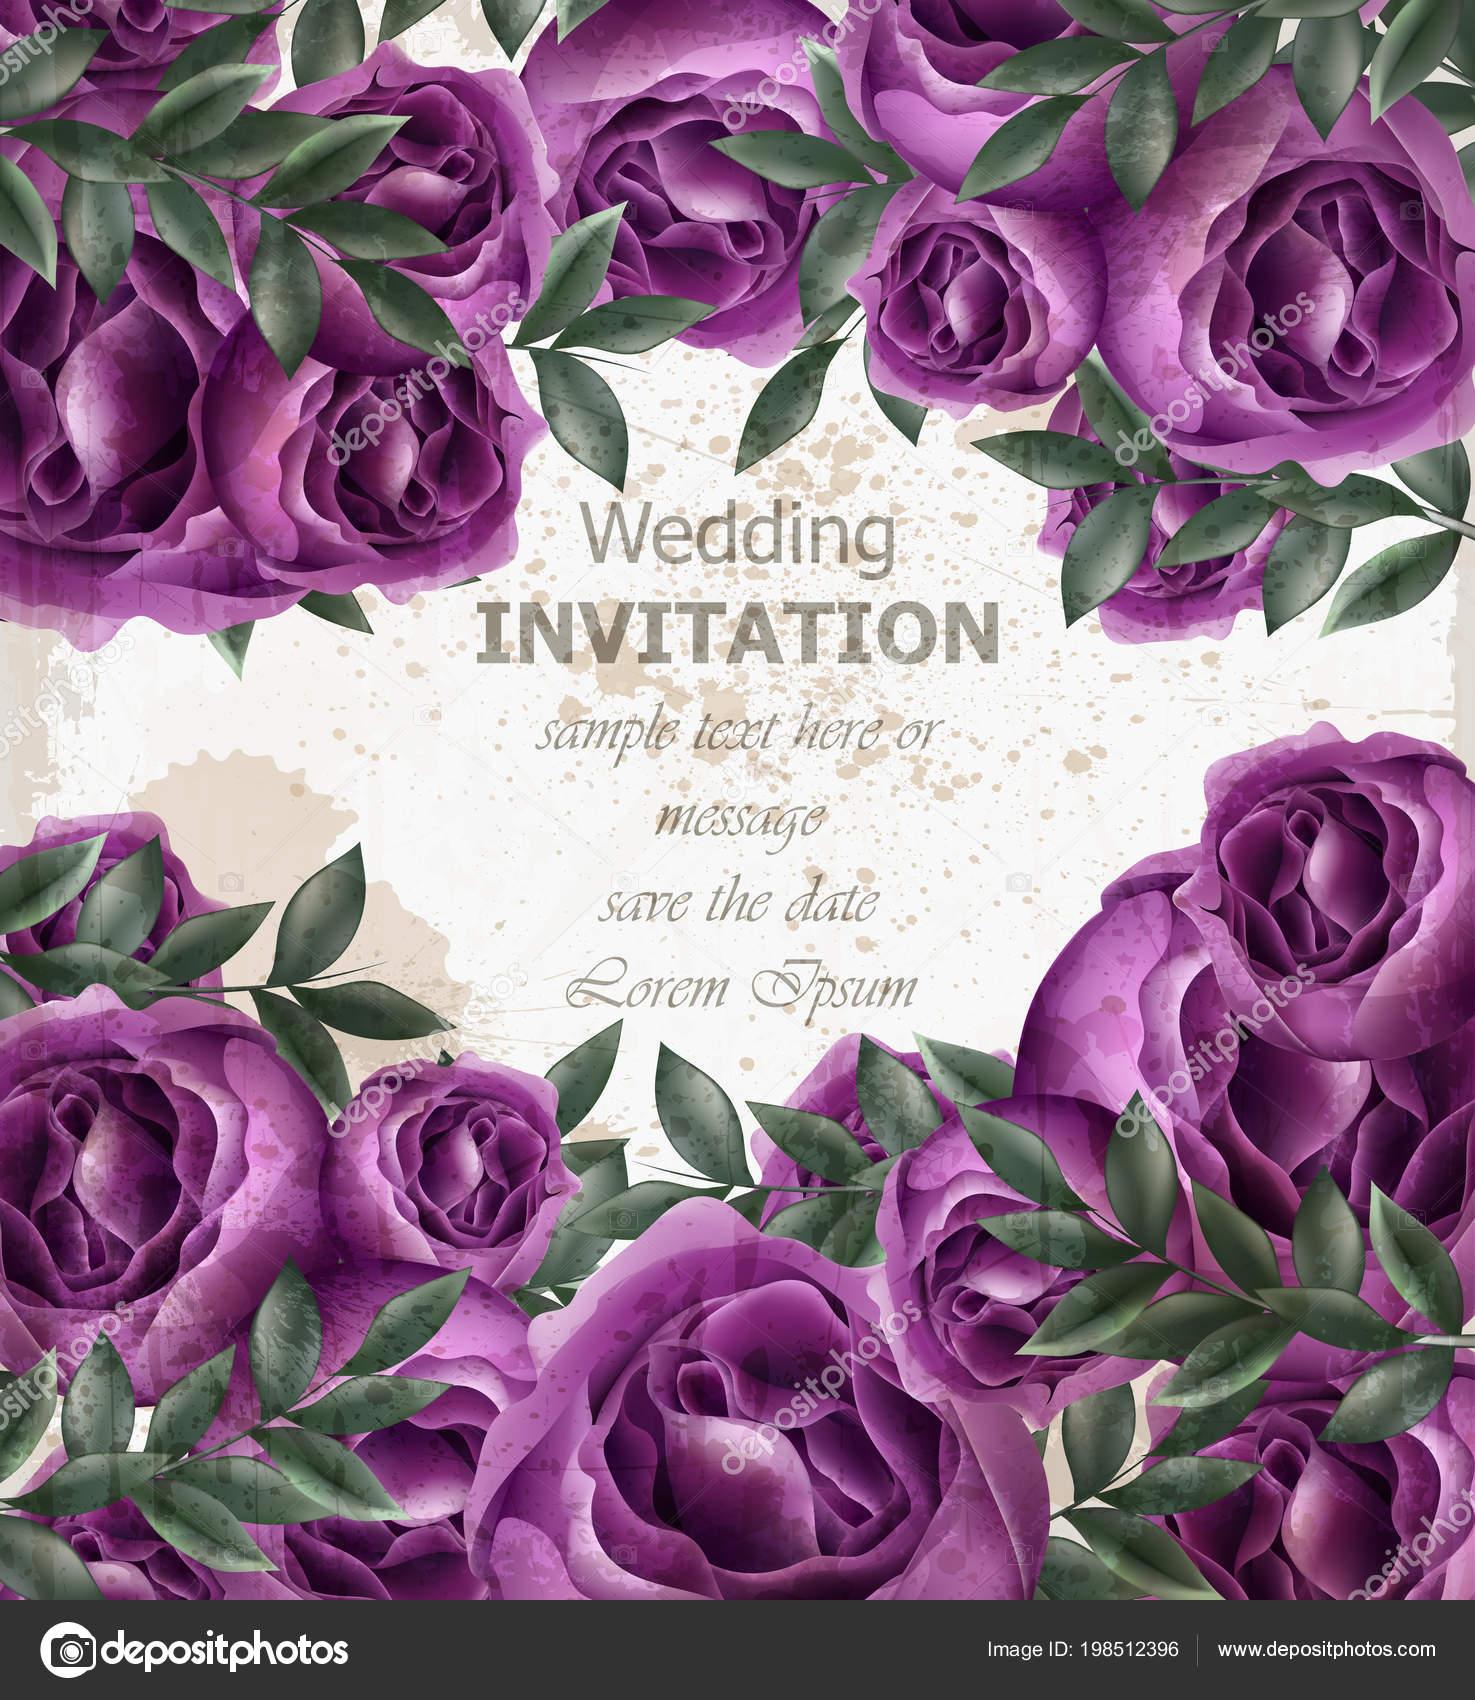 Wedding Invitation roses card Vector. Beautiful violet roses flowers ...